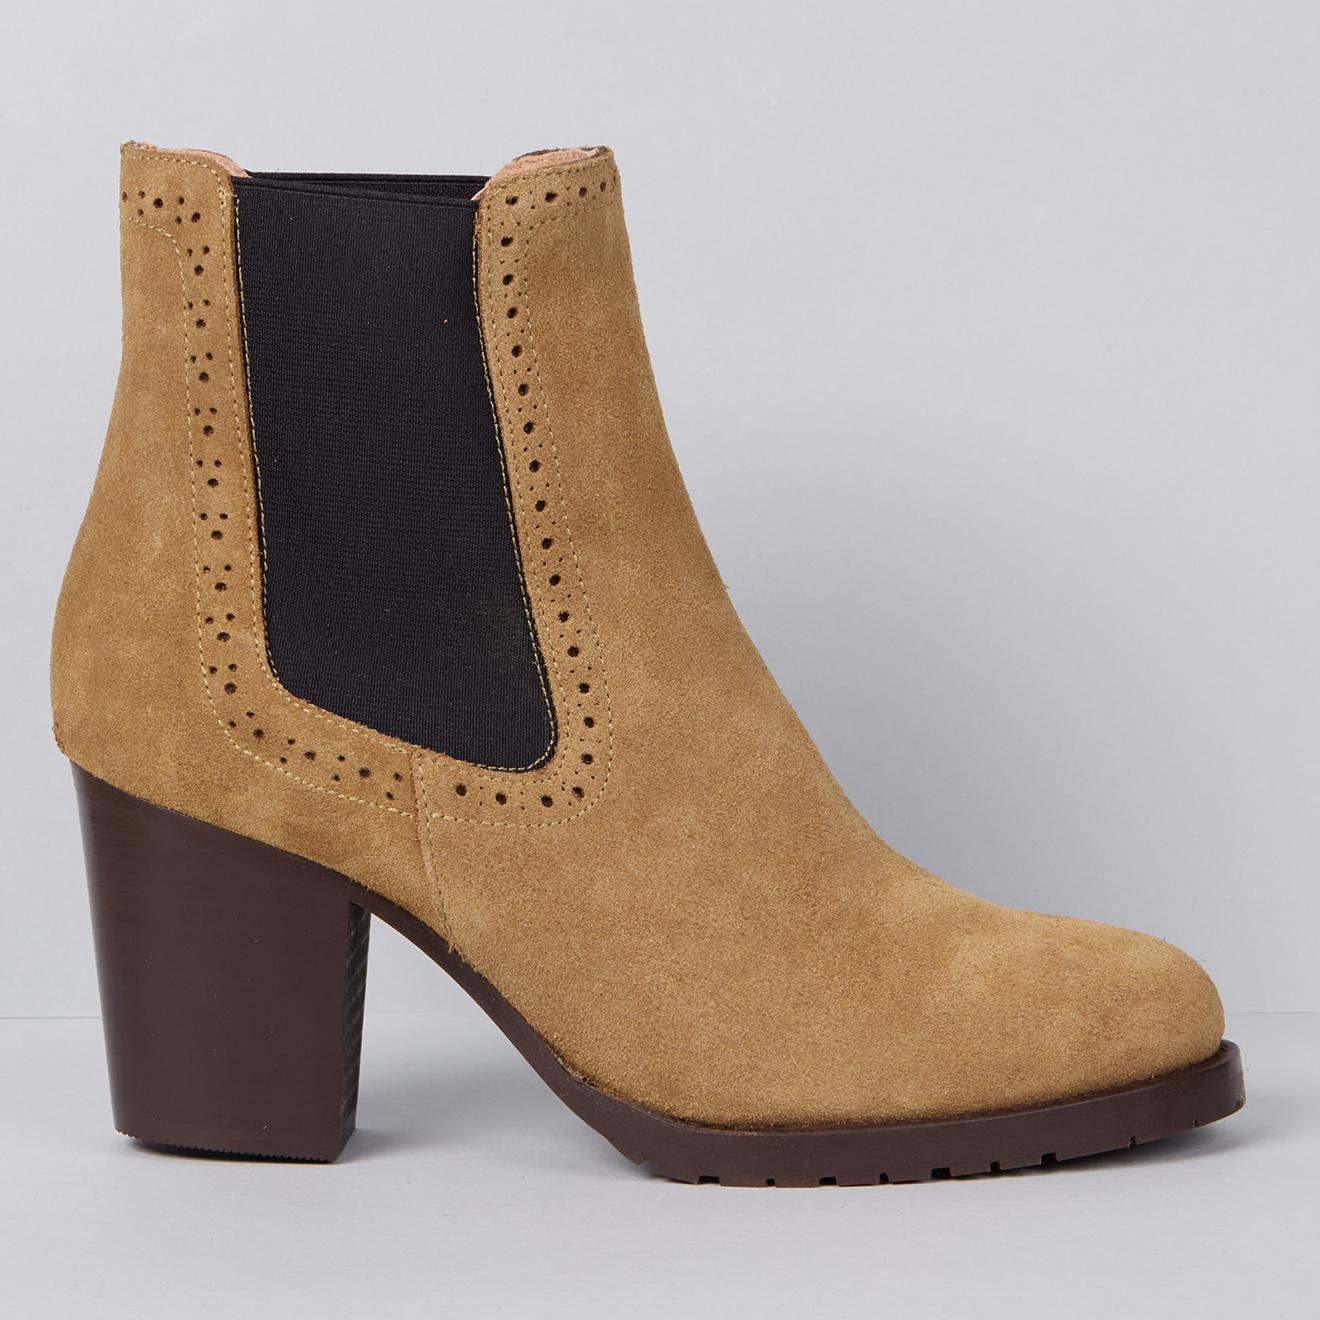 Chelsea Boots en Velours de Cuir Nathalie safari - Talon 7.5 cm - Apologie - Modalova